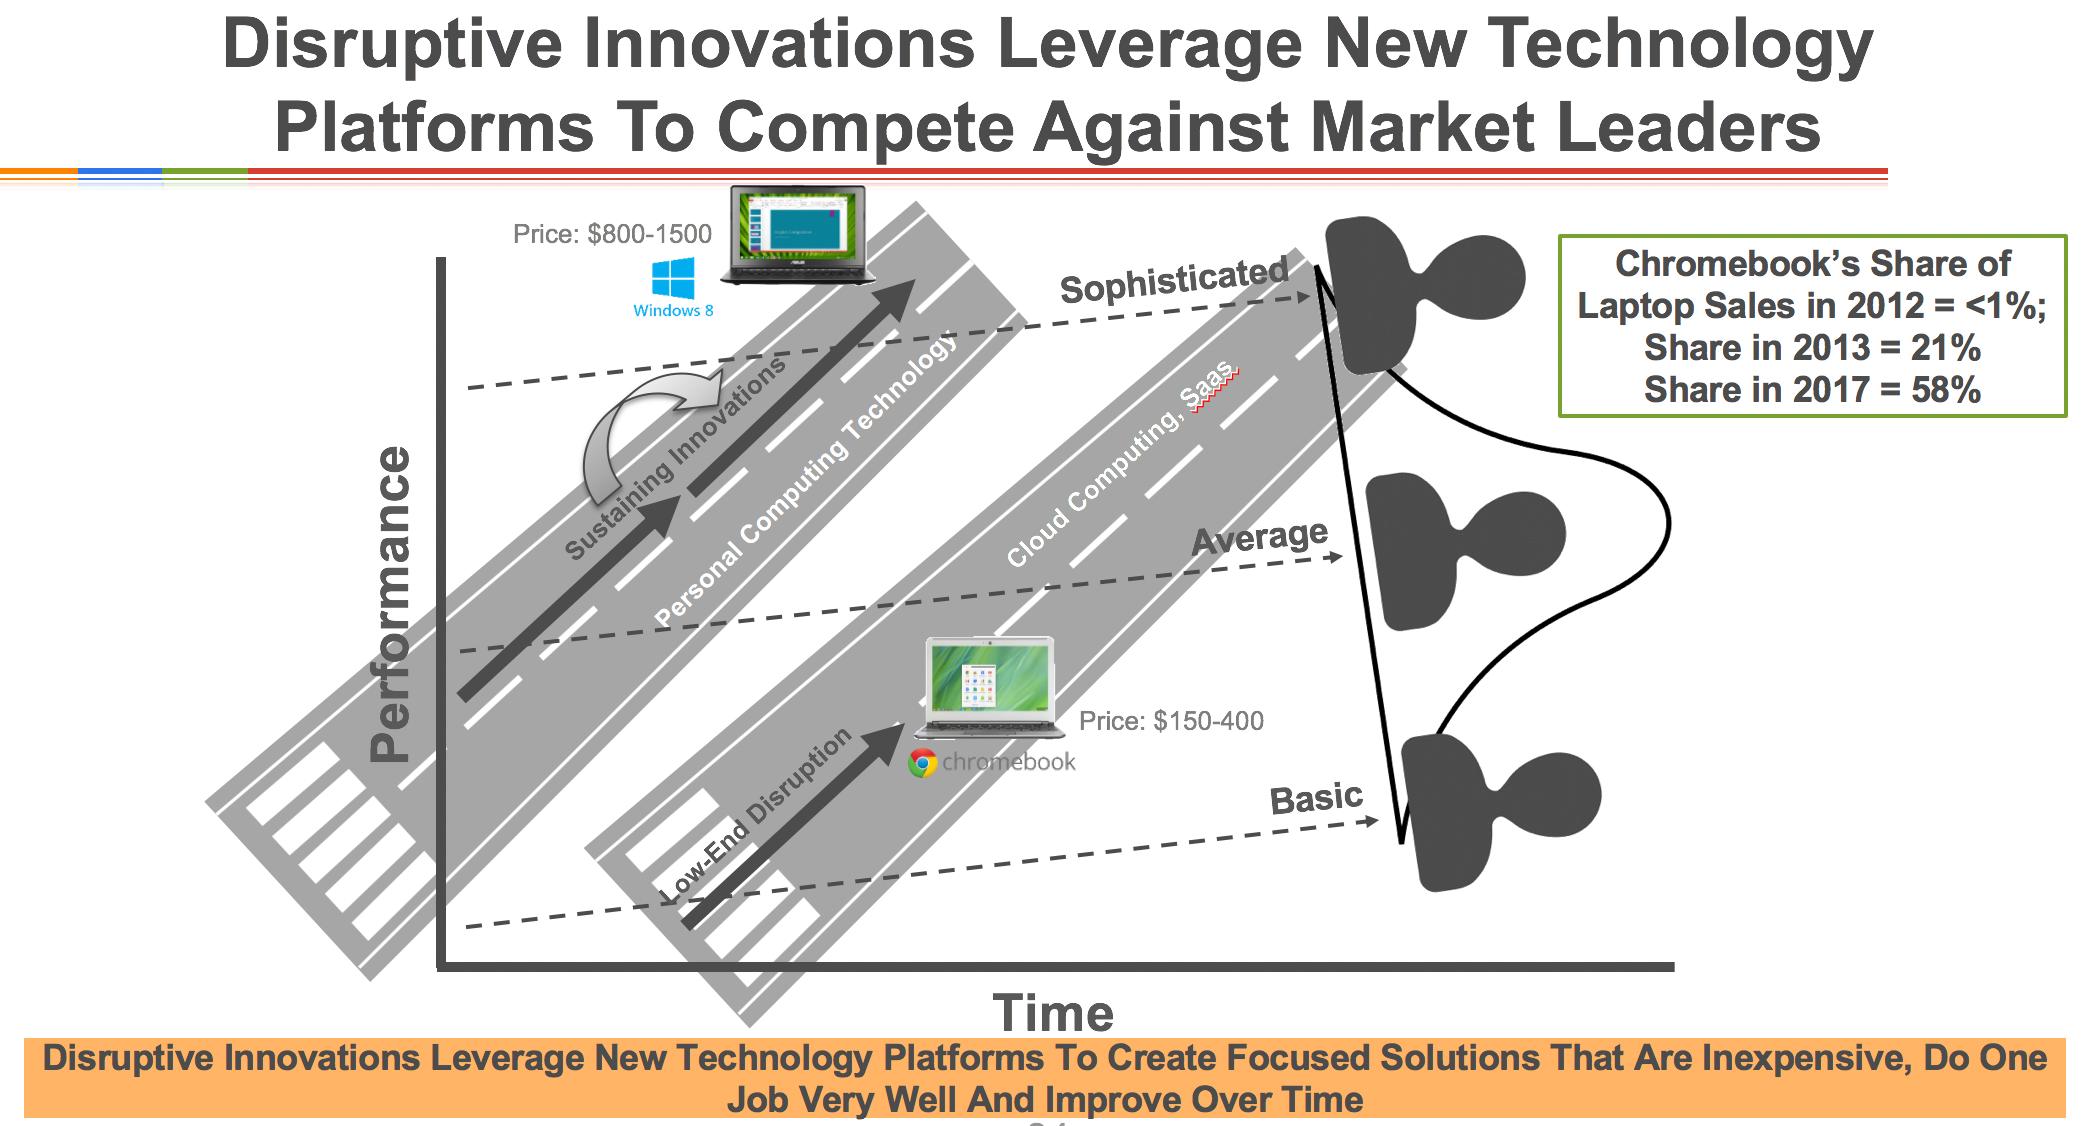 disruptive innovation example chromebooks